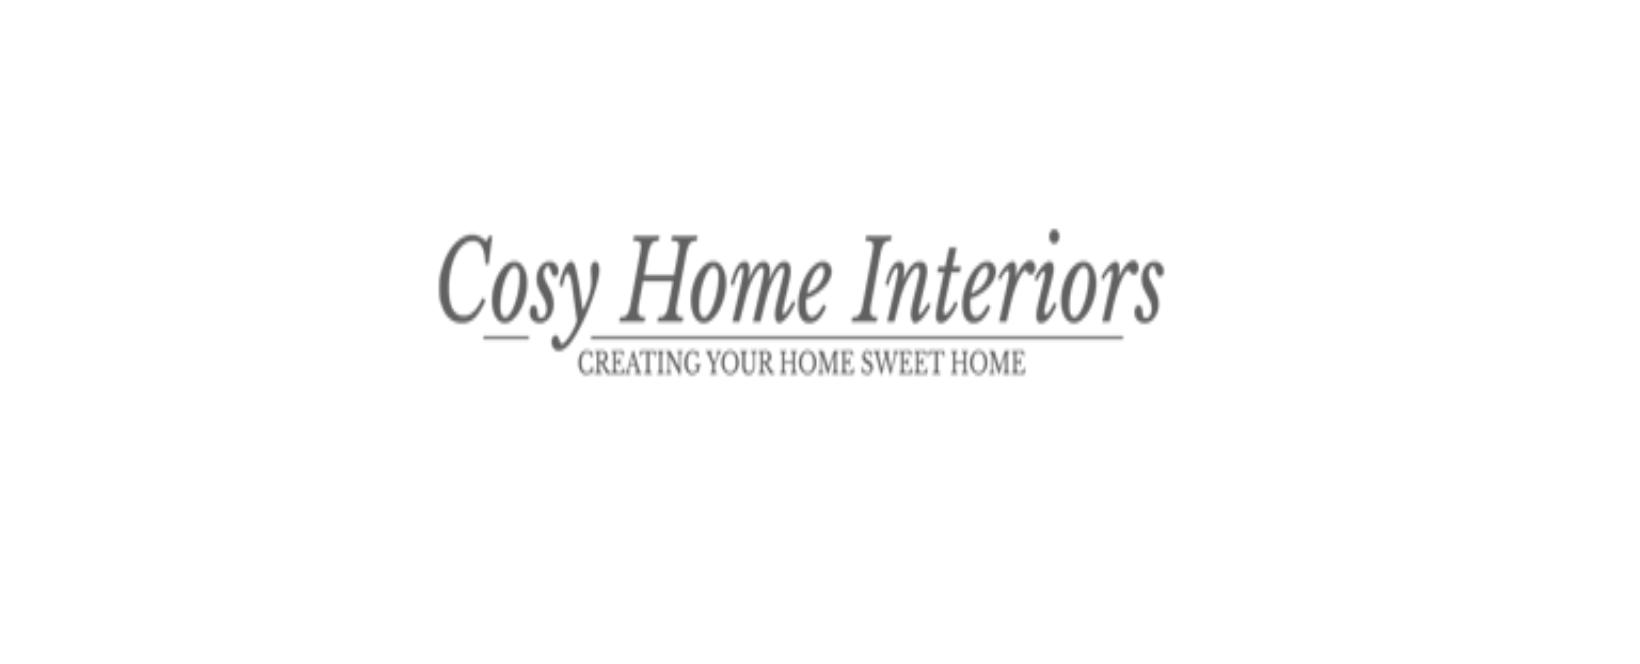 Cosy Home Interiors Discount Code 2021